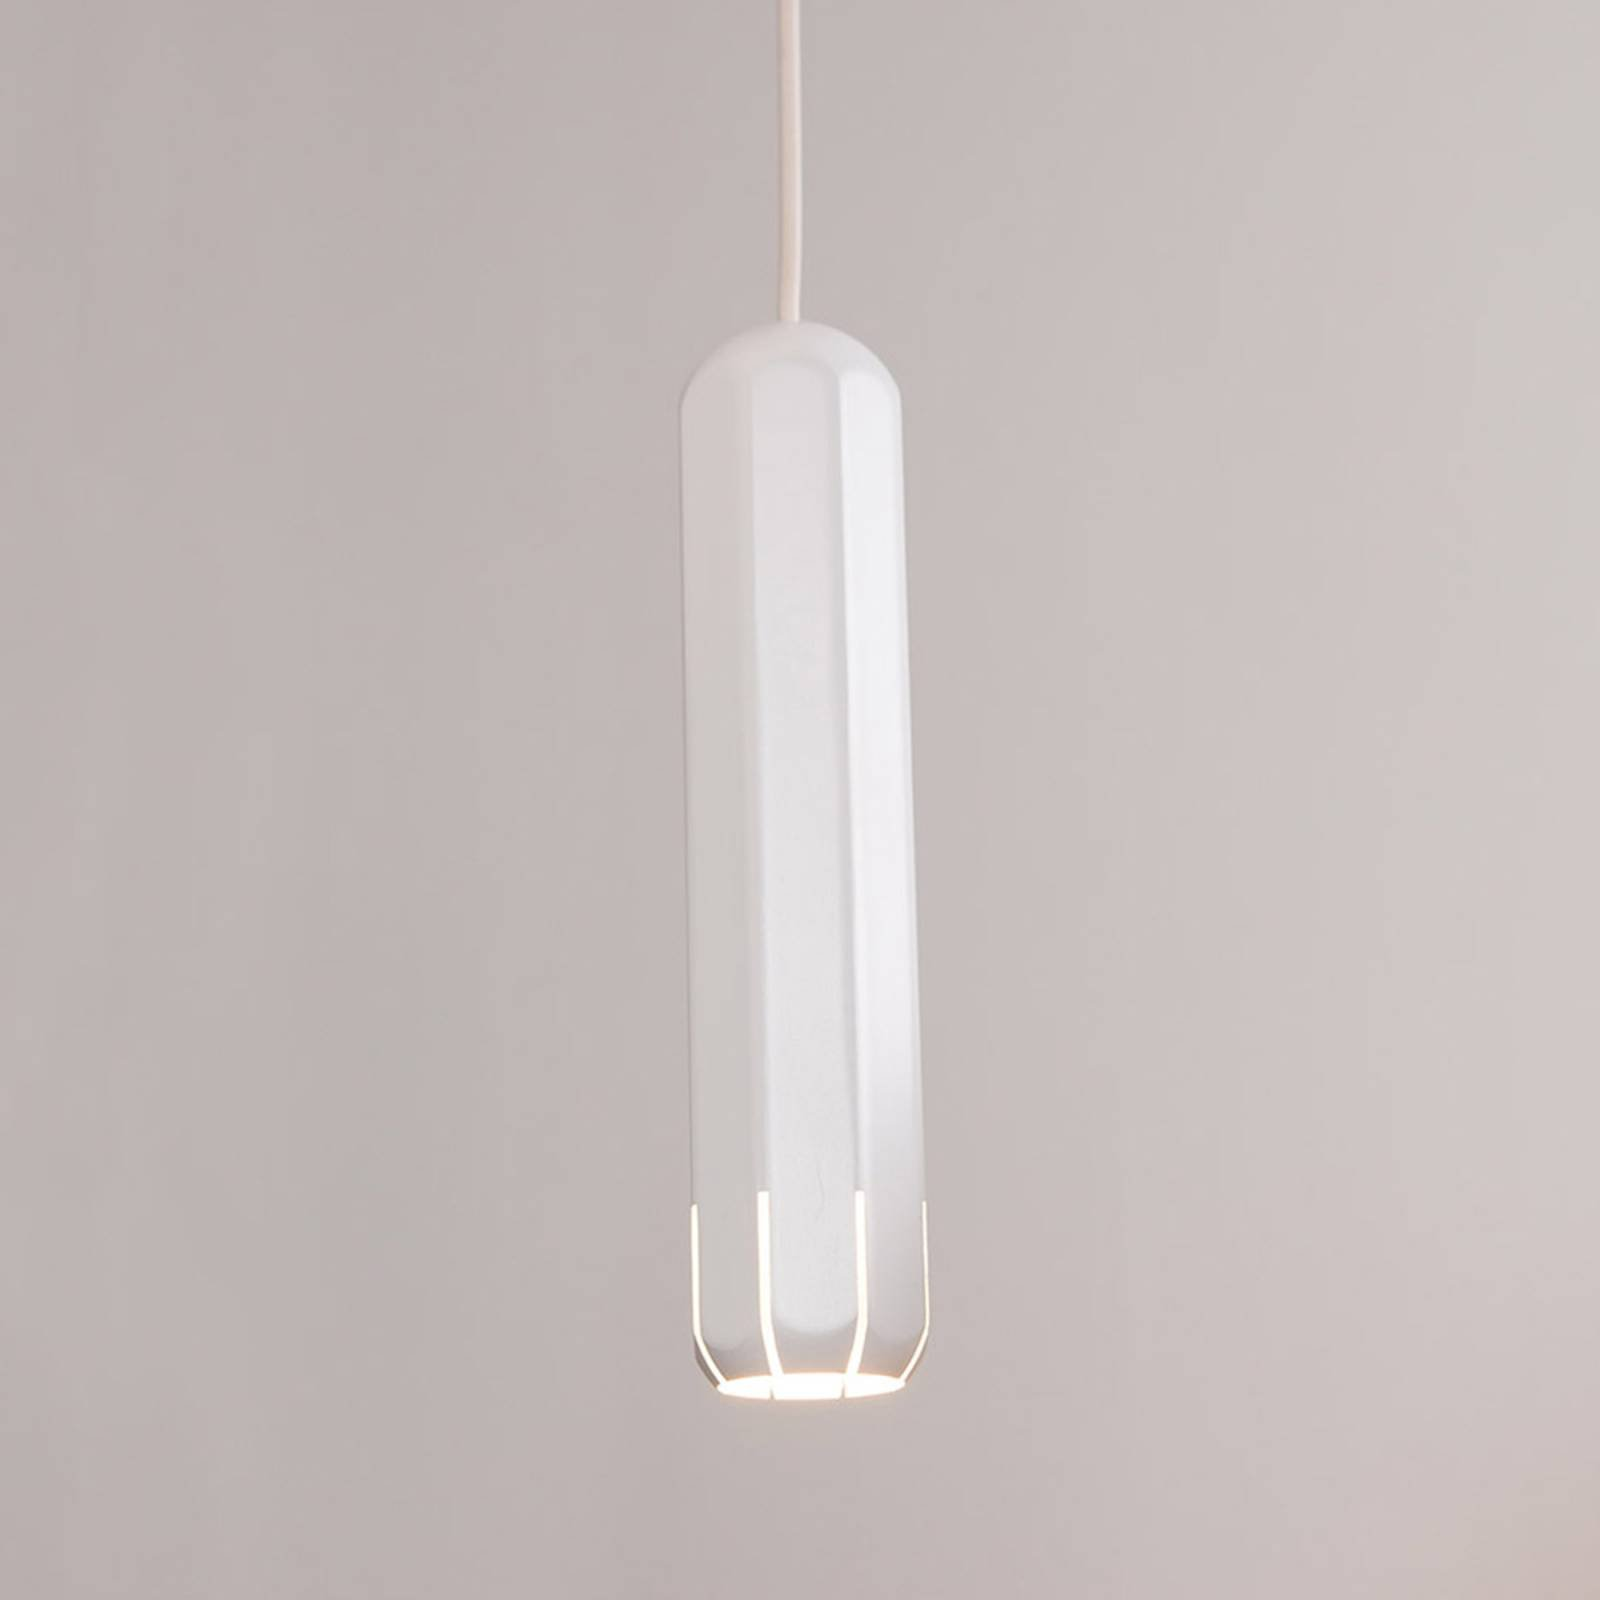 Innermost Brixton Spot 20 LED-hengelampe, hvit